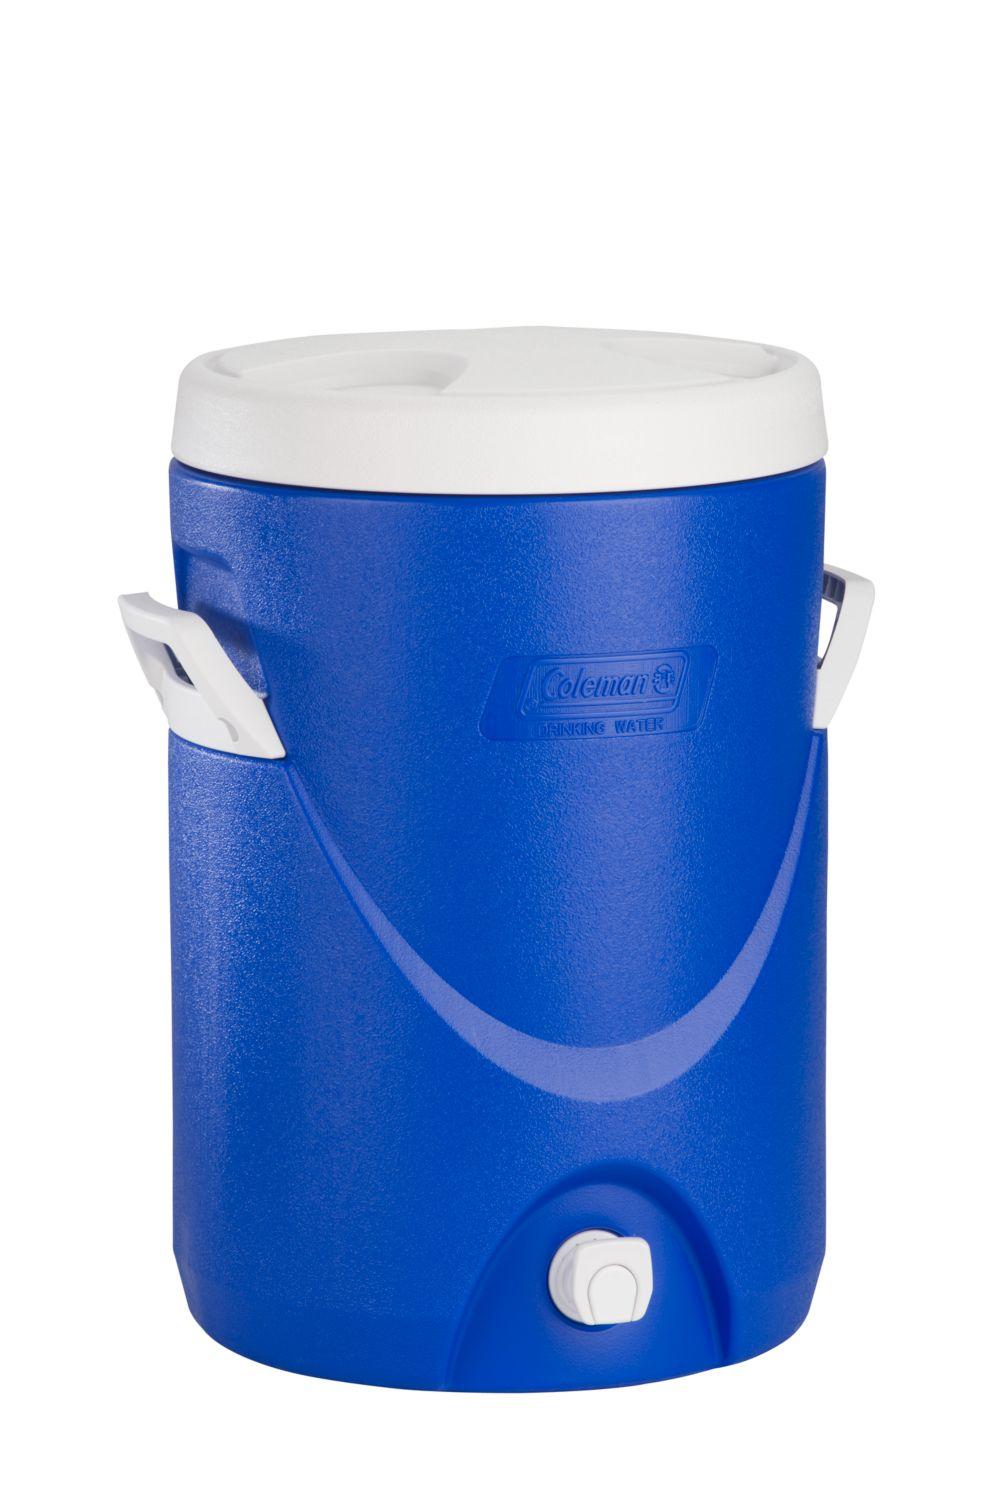 5 Gallon Beverage Container - Blue